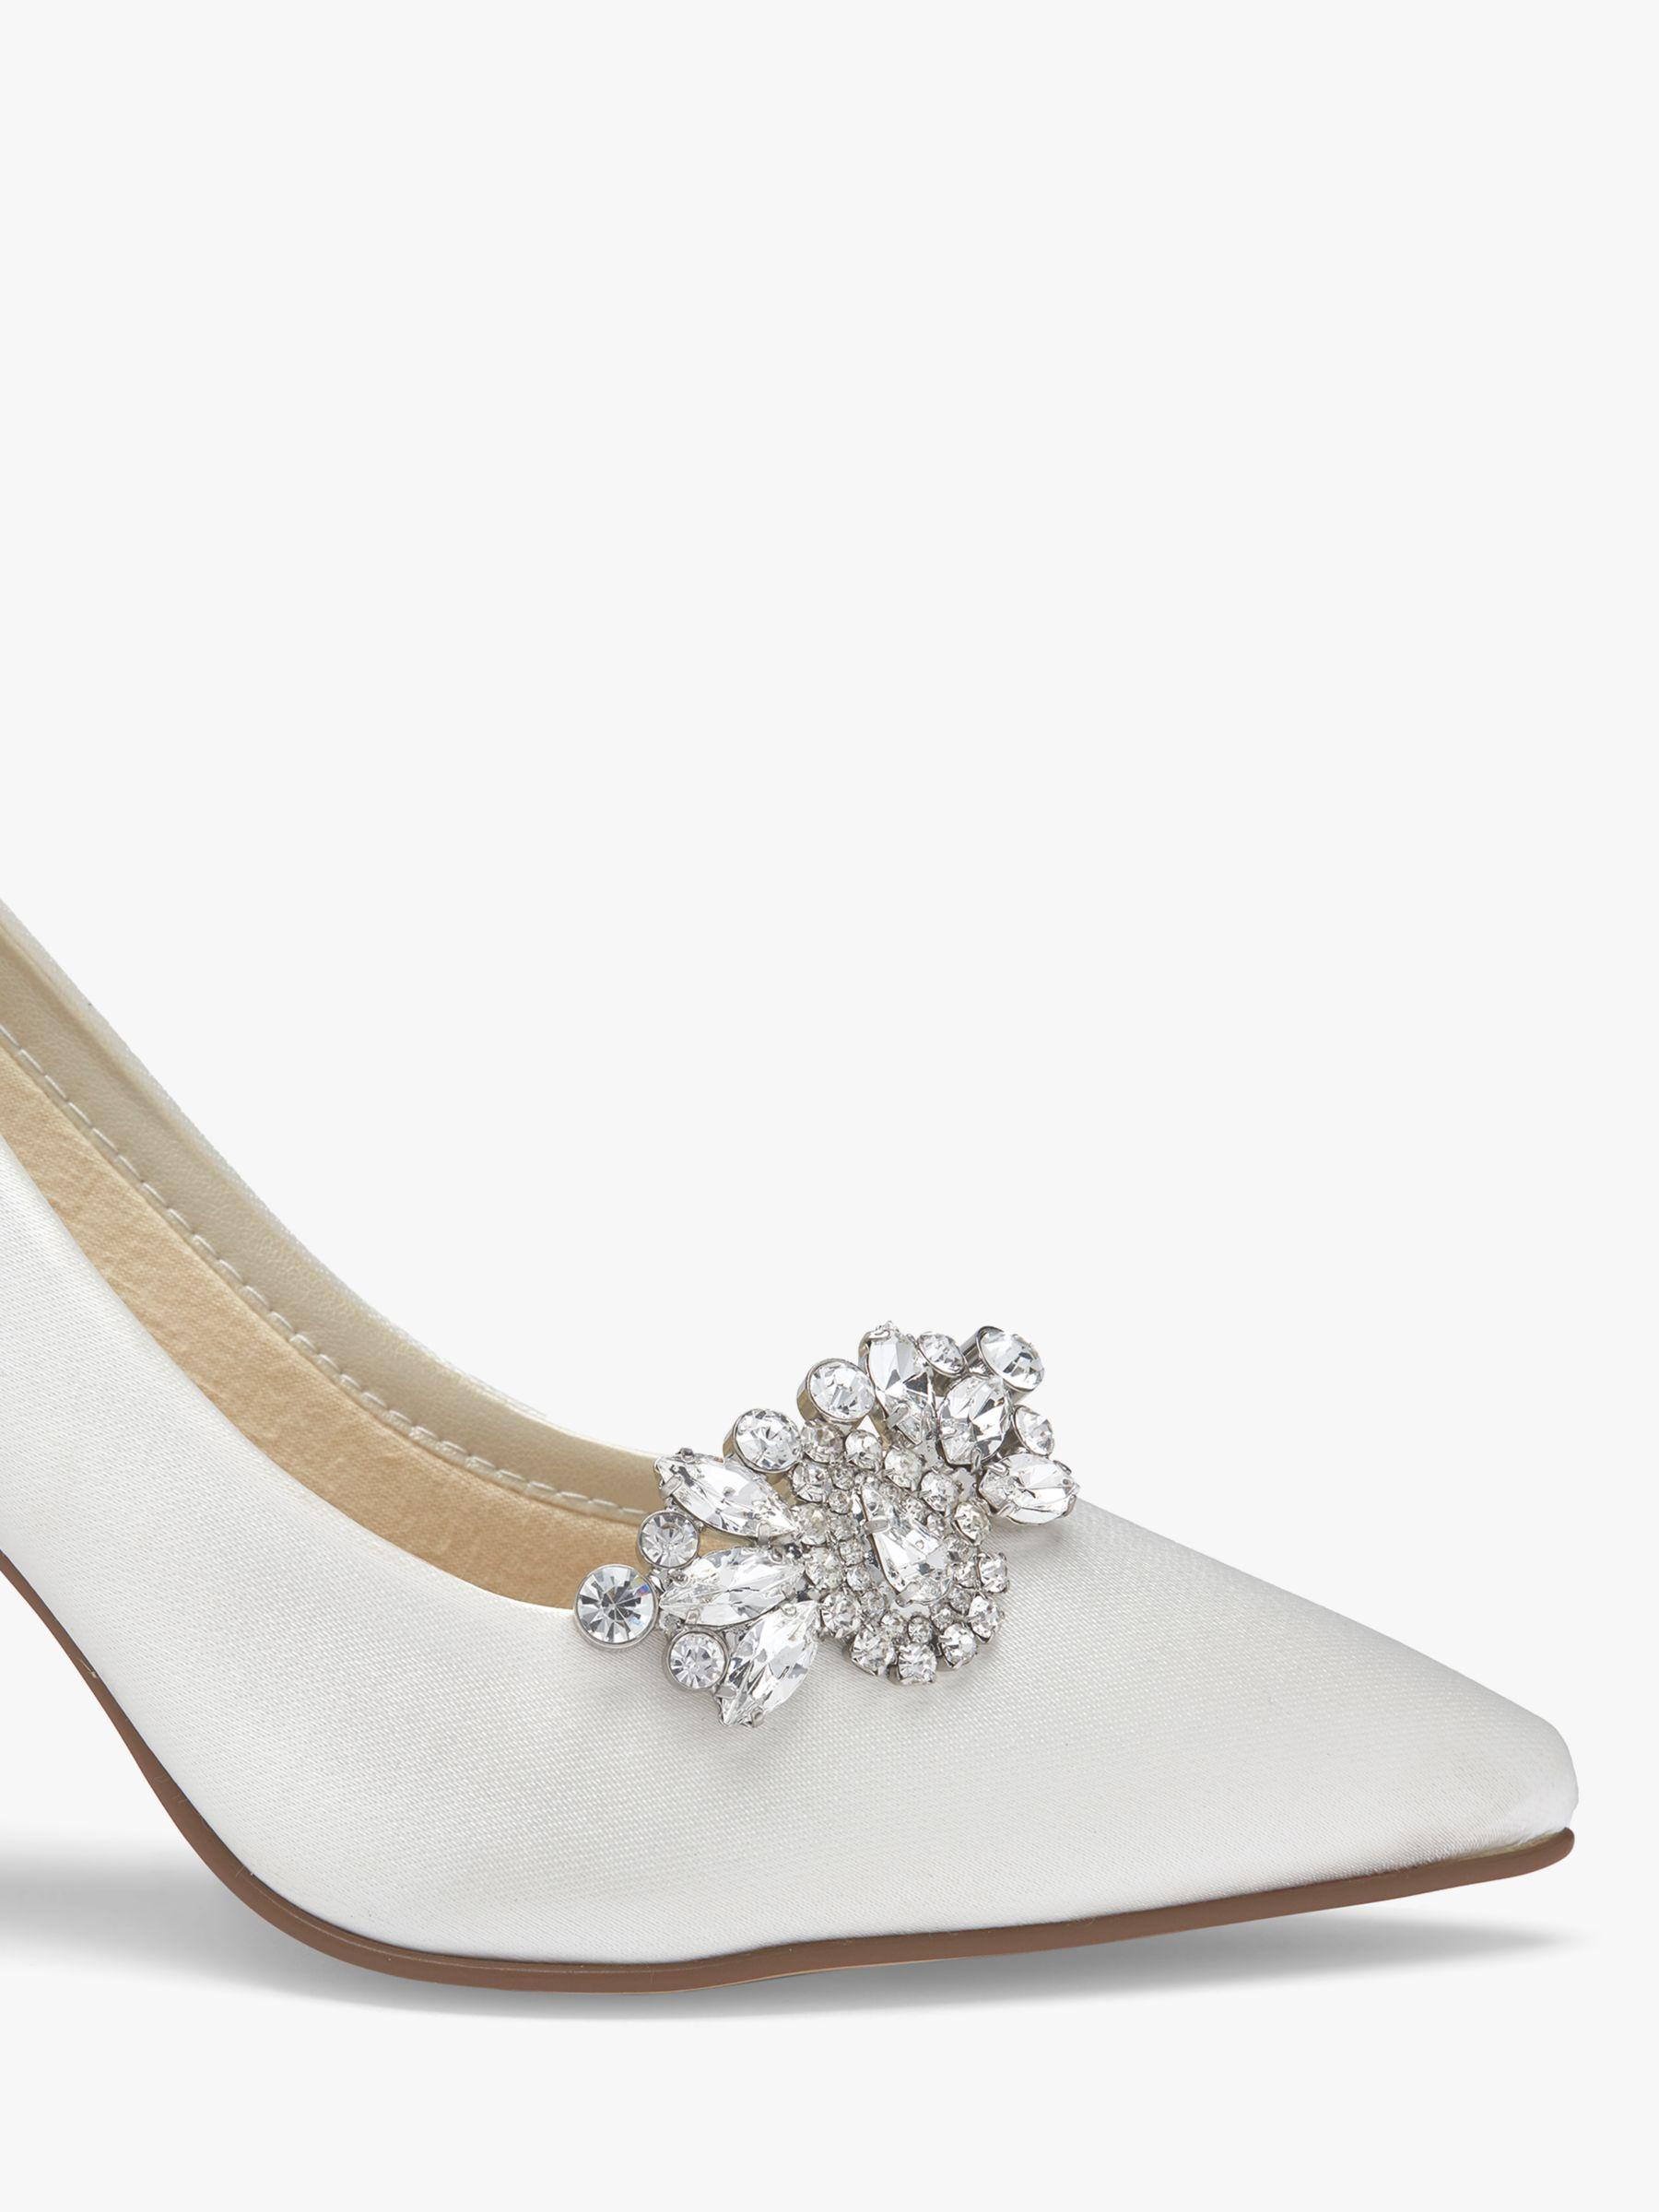 Rainbow Club Rainbow Club Myra Diamante Embellished Shoe Clips